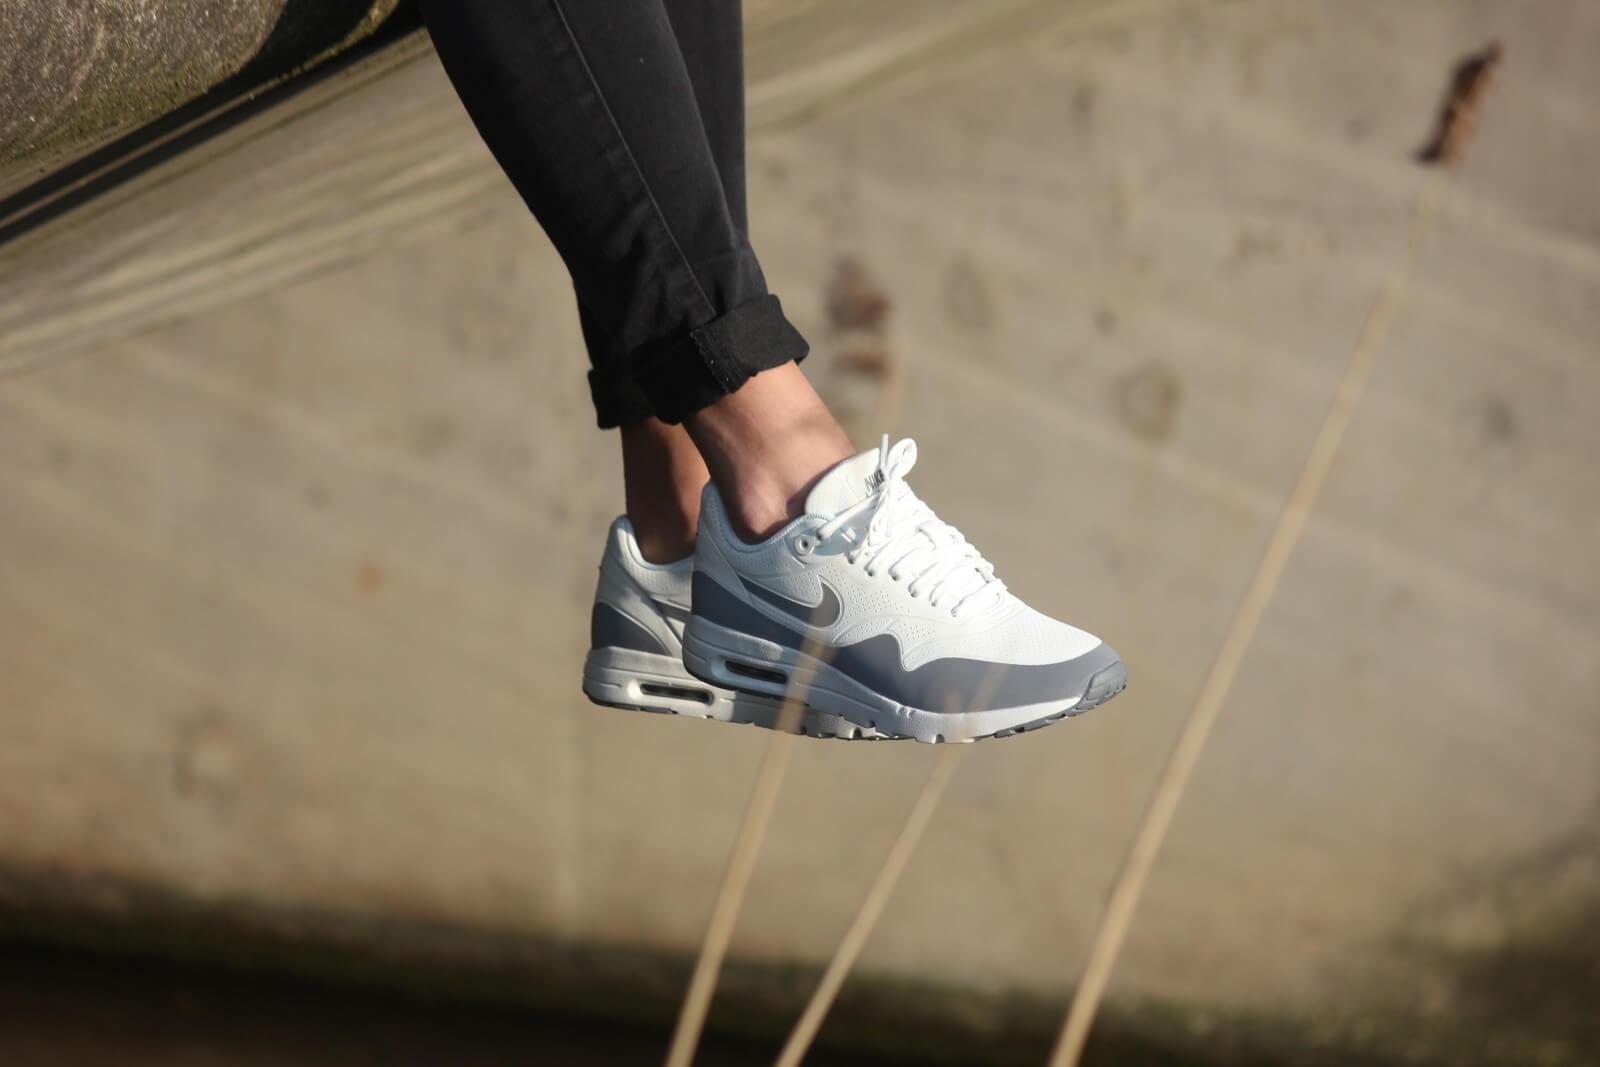 Nike WMNS Air Max 1 Ultra Moire Summit White Grey Metallic 704995 101